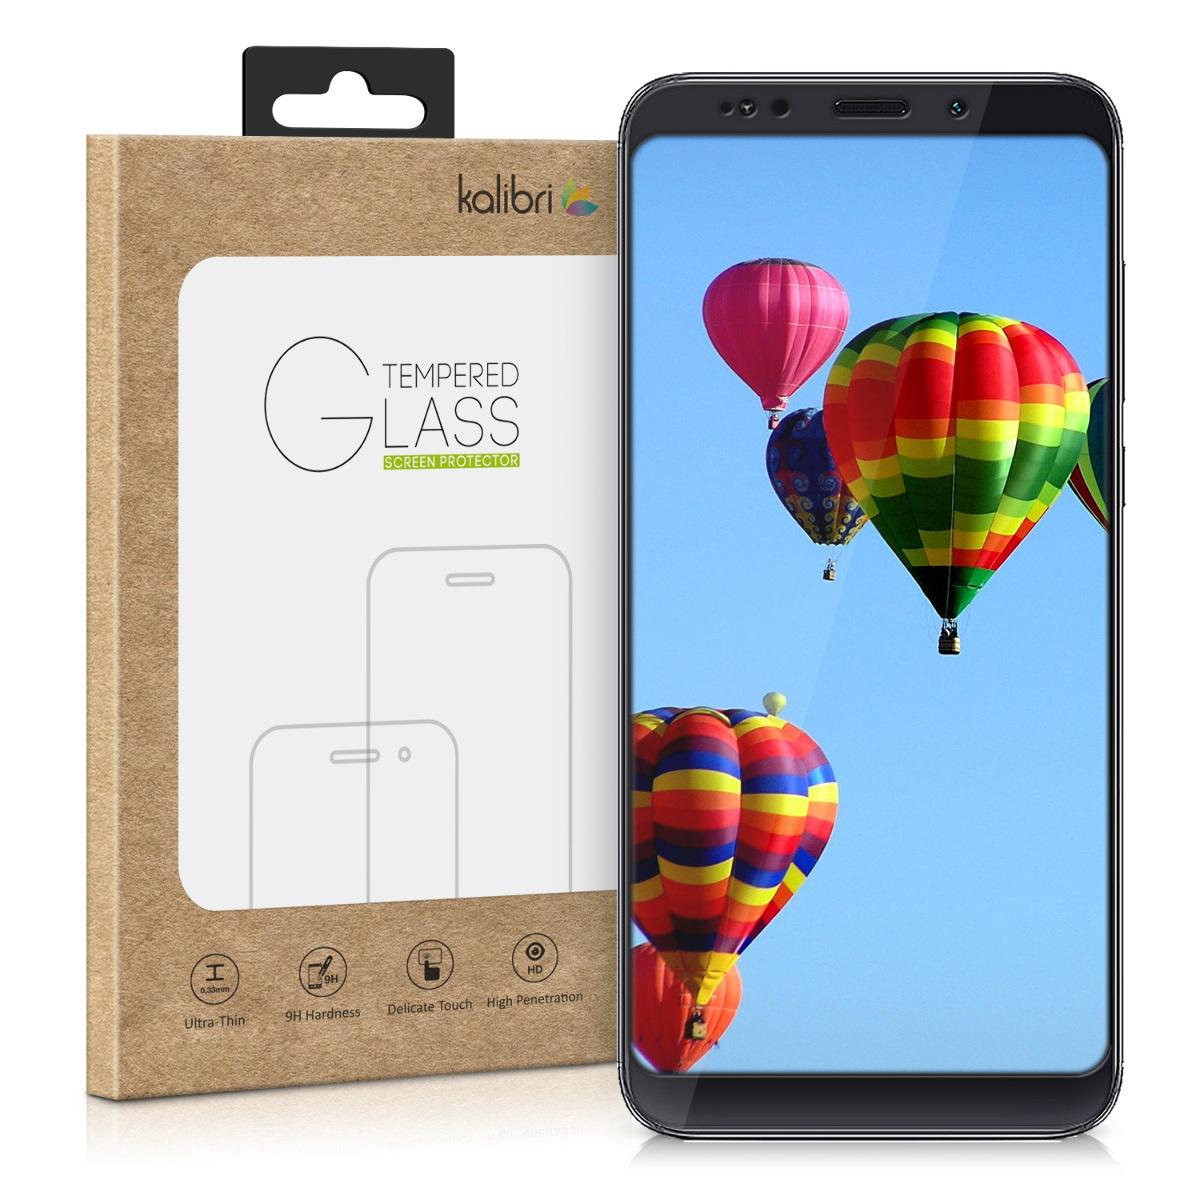 Kalibri Tempered Glass - Fullface Αντιχαρακτικό Γυαλί Οθόνης Xiaomi Redmi Note 5 / Note 5 Pro (45870.01)